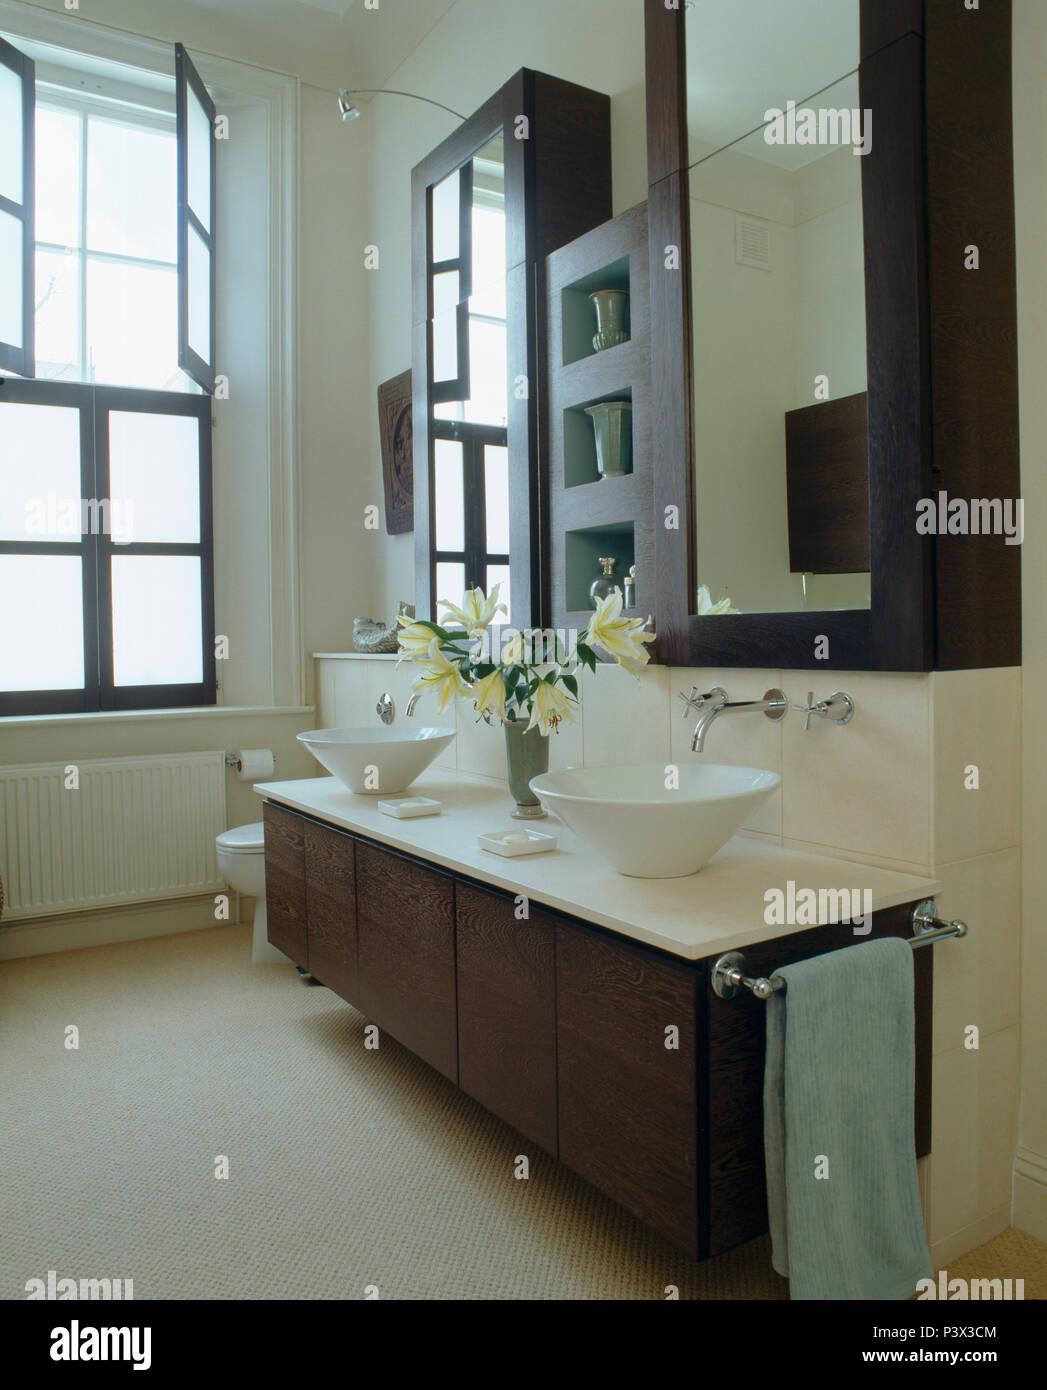 White ceramic bowl-basins on vanity unit below mirrored cabinets in modern monochromatic bathroom - Stock Image